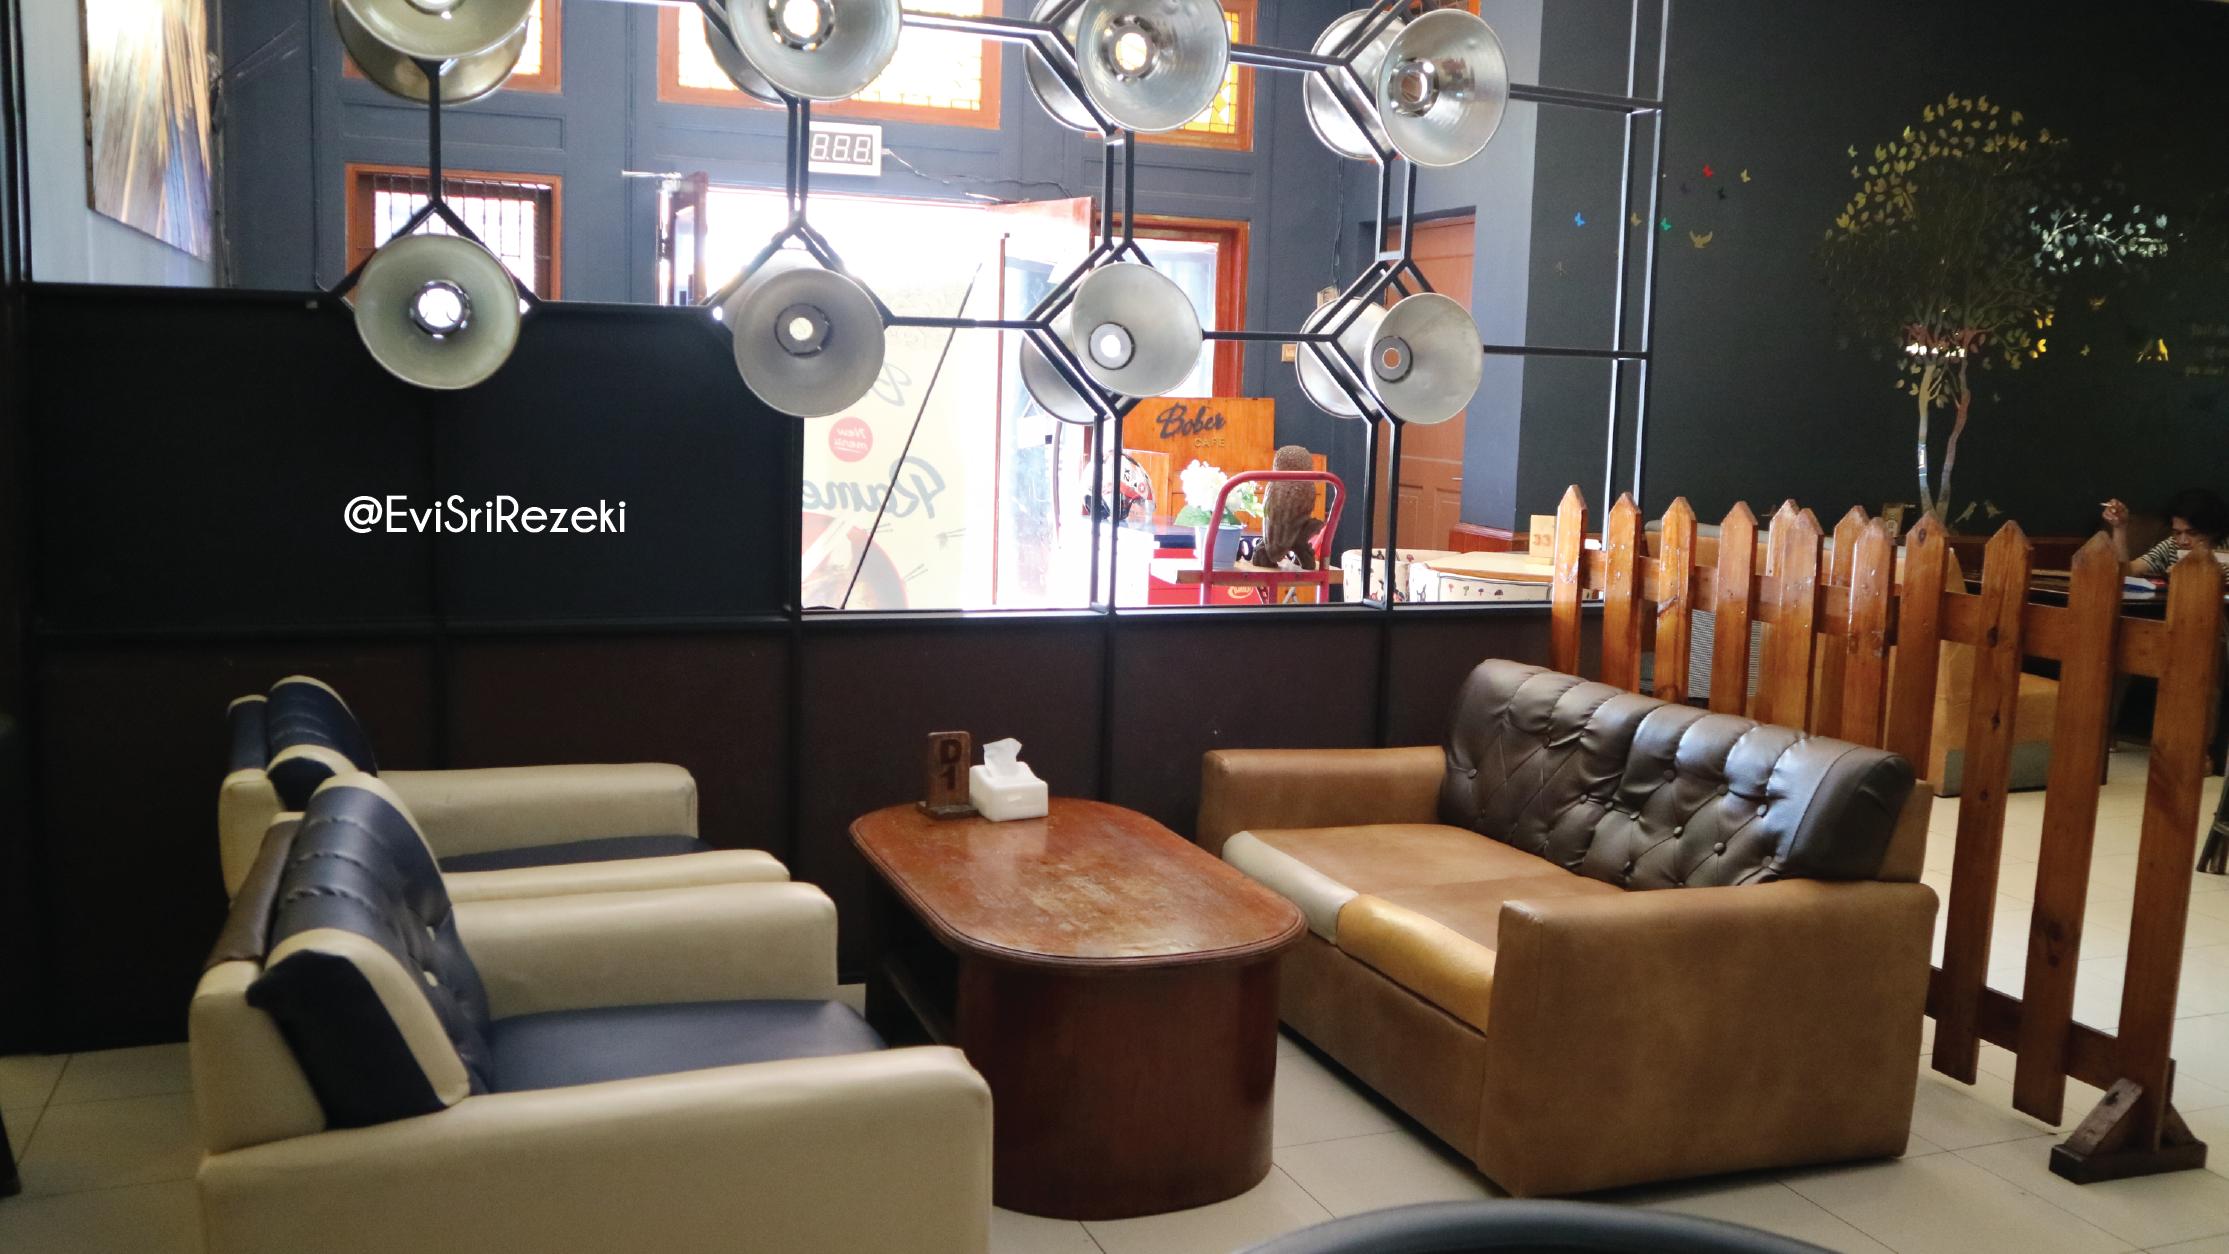 Daftar Cafe 24 Jam Di Bandung Yang Hits Banget Info